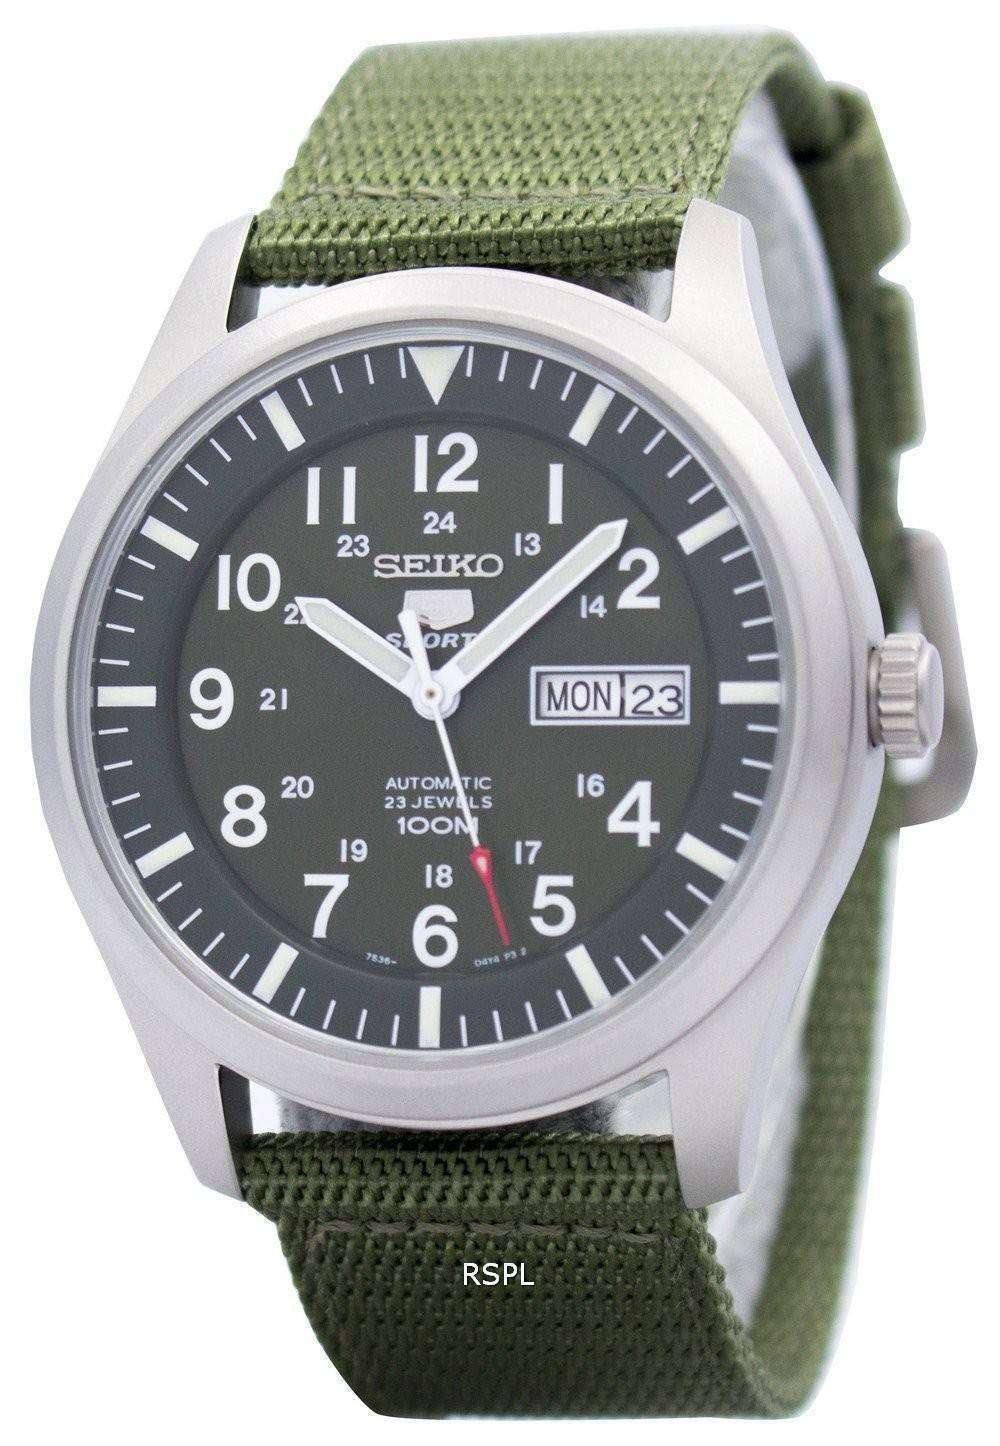 525535bff Reloj Seiko 5 Sports automático militar SNZG09K1 SNZG09 SNZG09K varonil